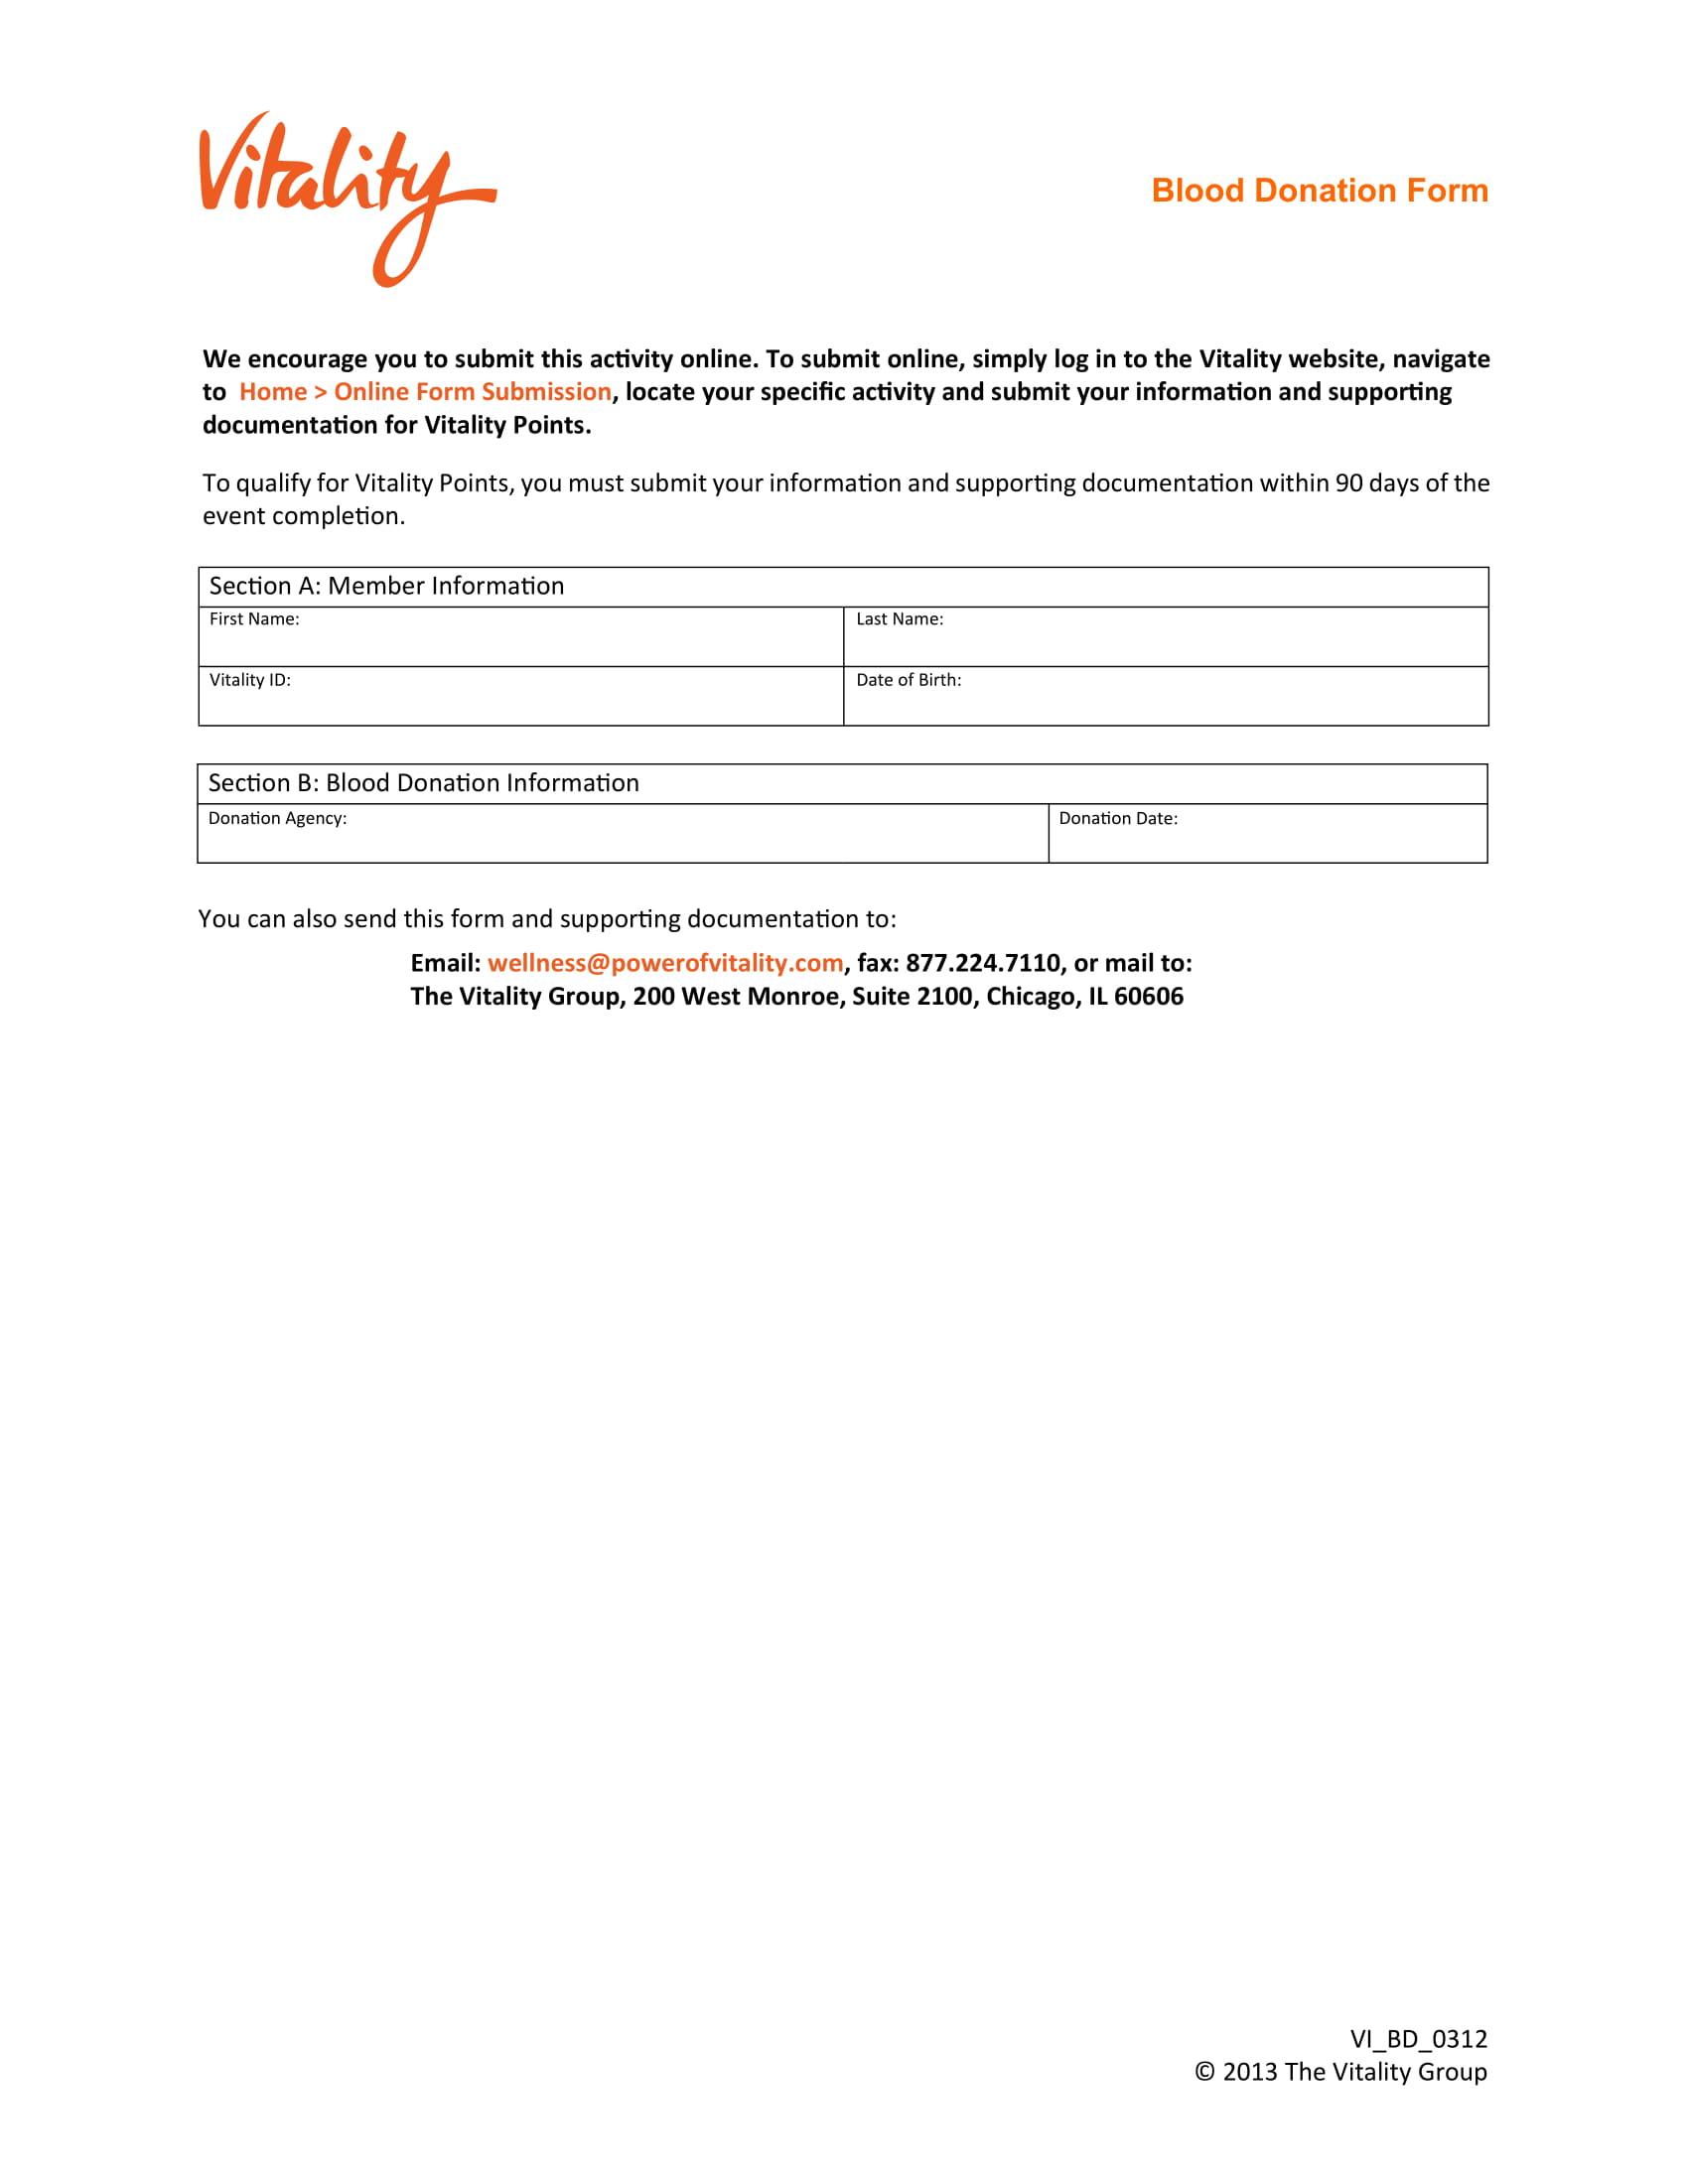 4+ Blood Donation Forms - PDF, DOC